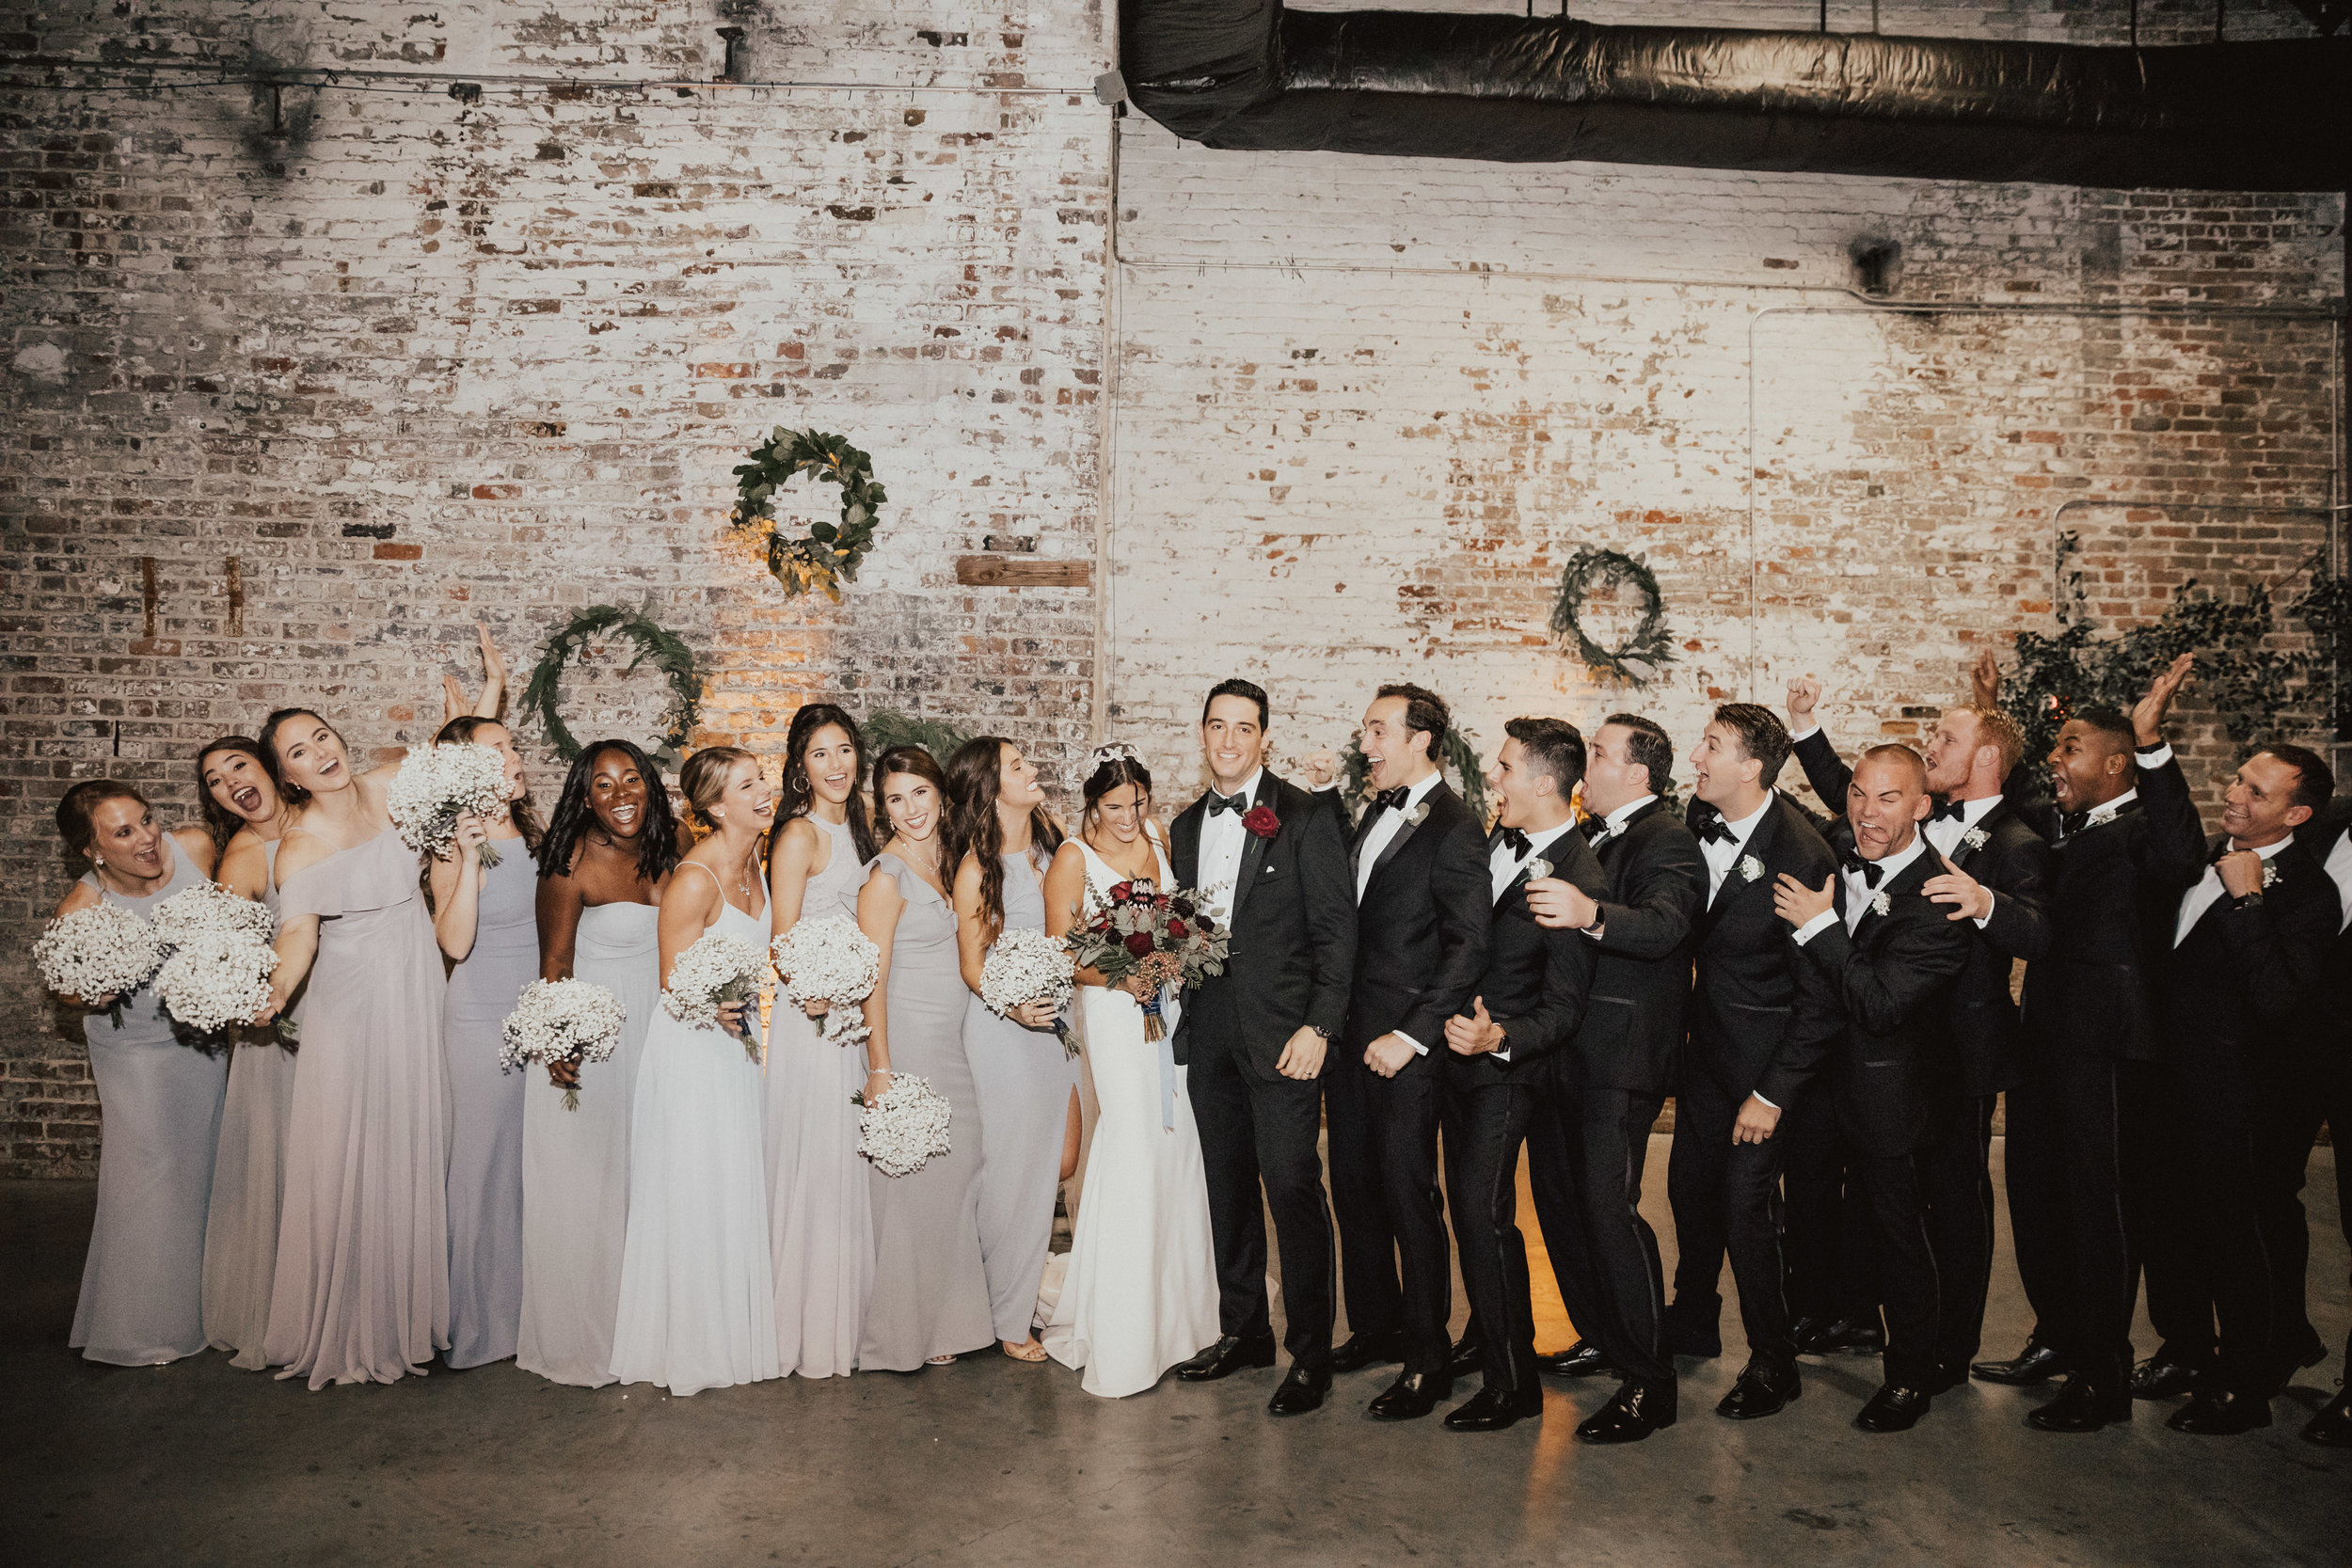 magners wedding (73 of 145).jpg